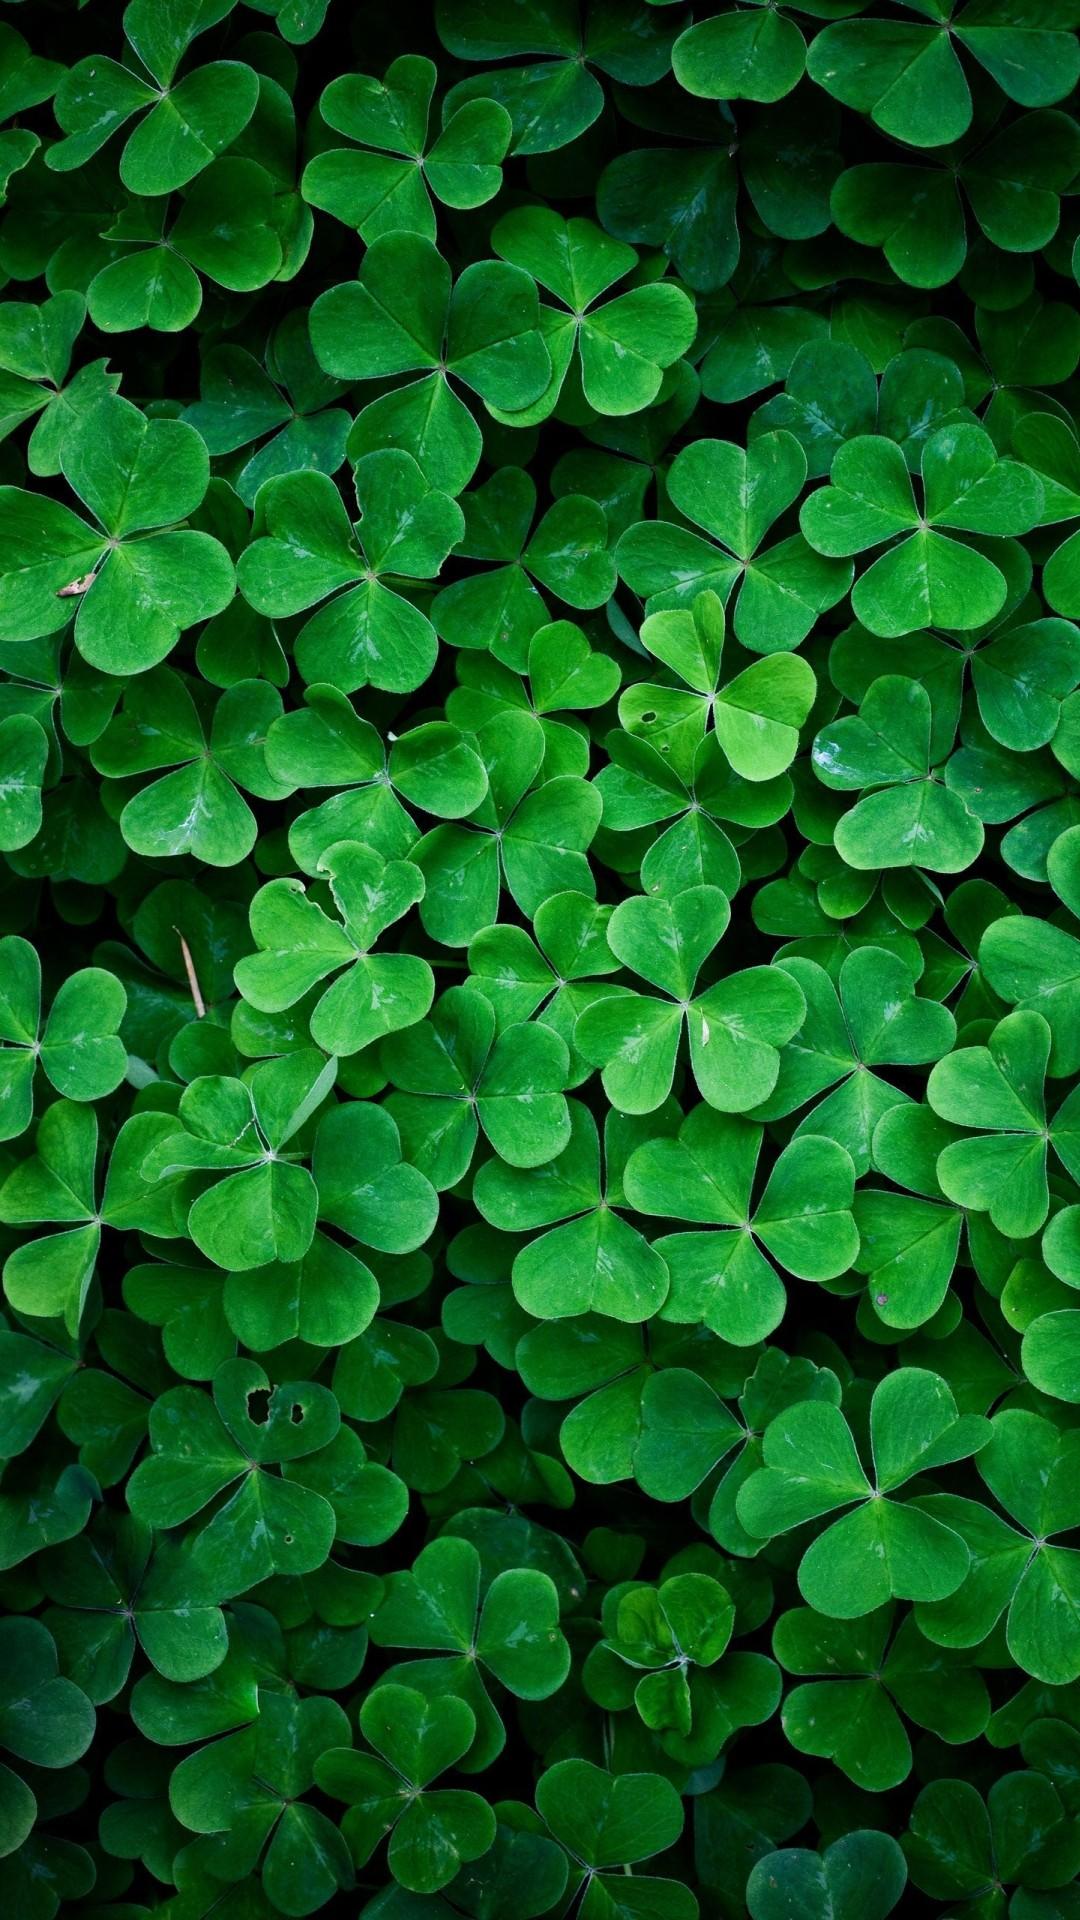 green nature hd retina wallpaper iphone 6 plus